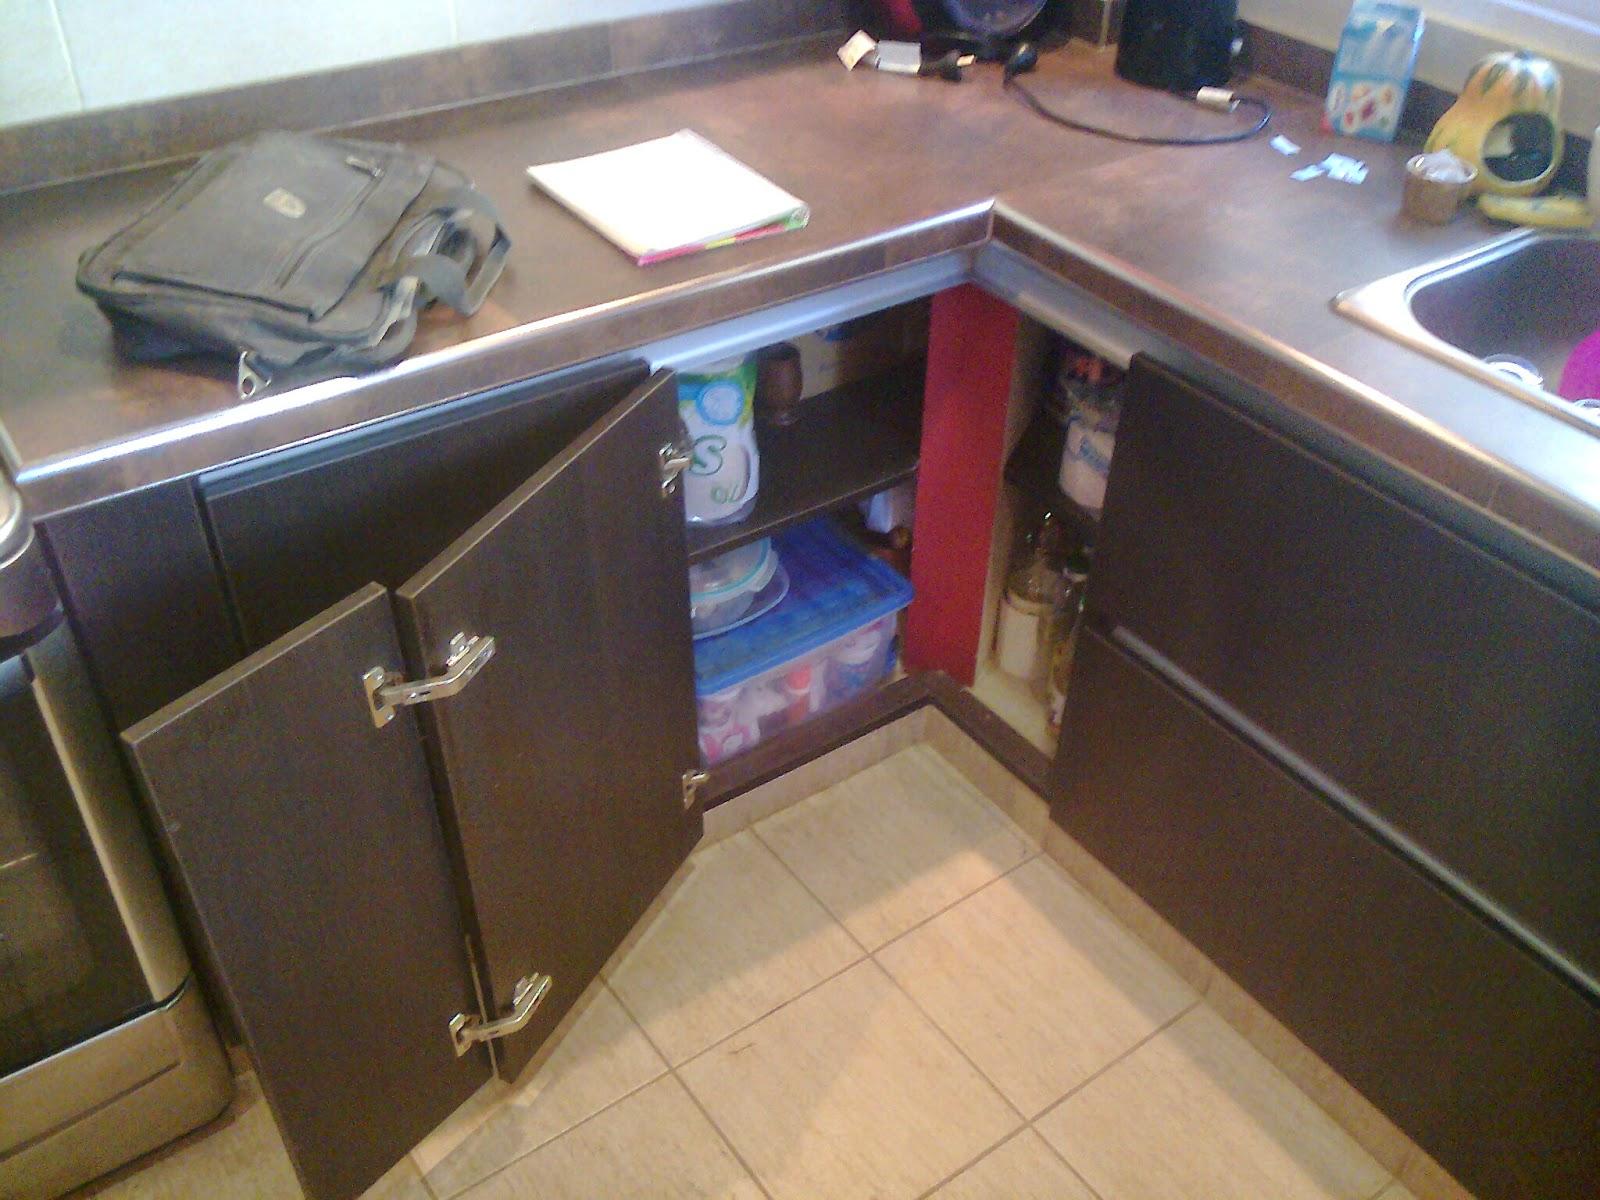 Benjamin mueble de cocina en melamina con canto pvc for Muebles de cocina en melamina